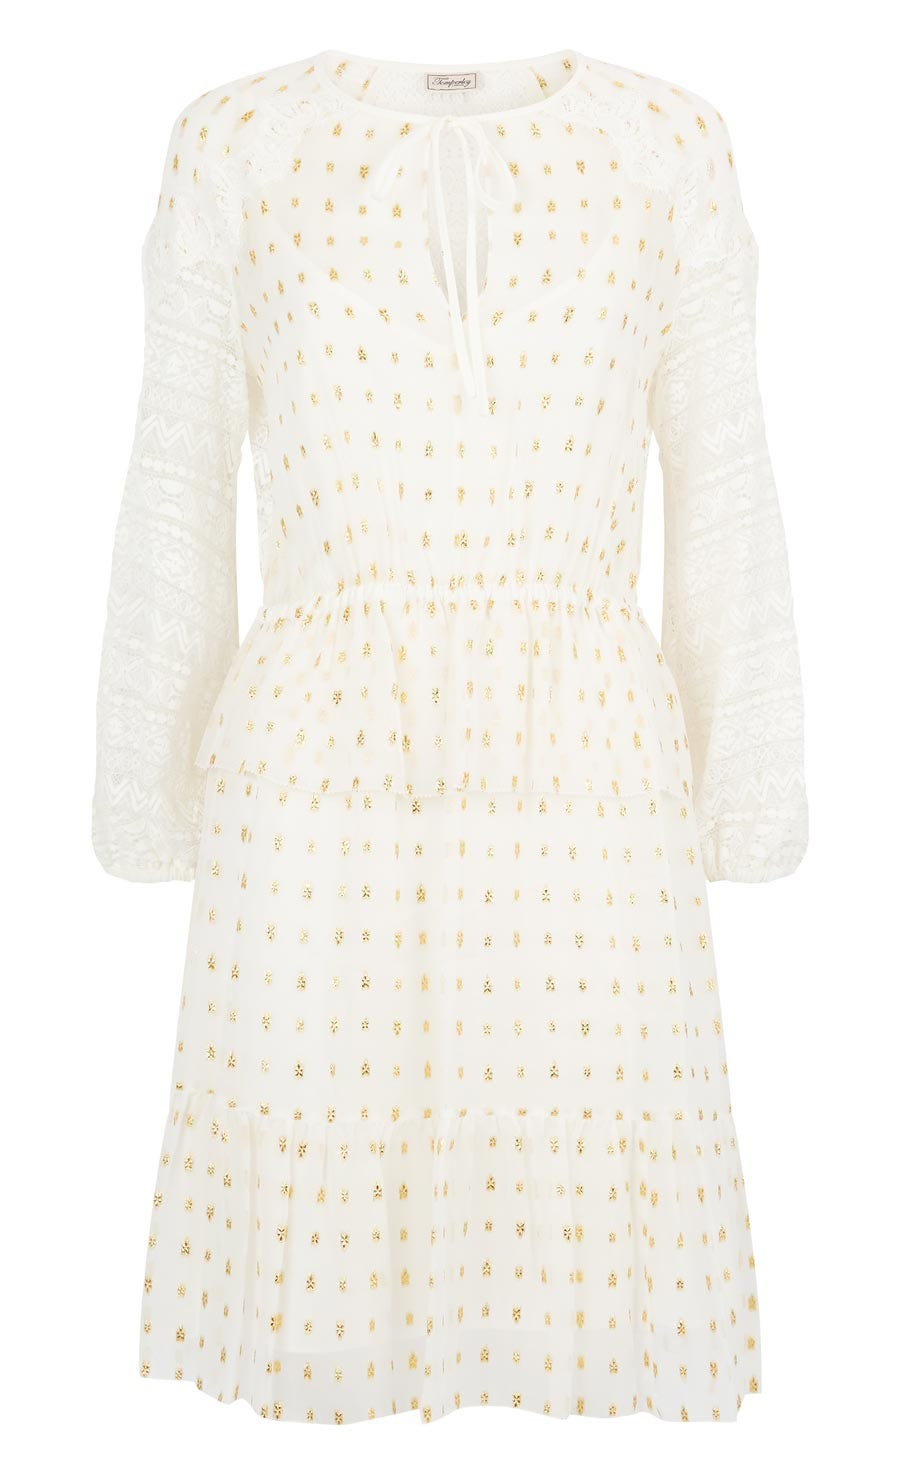 Wondering Lace Sleeved Dress, White Mix